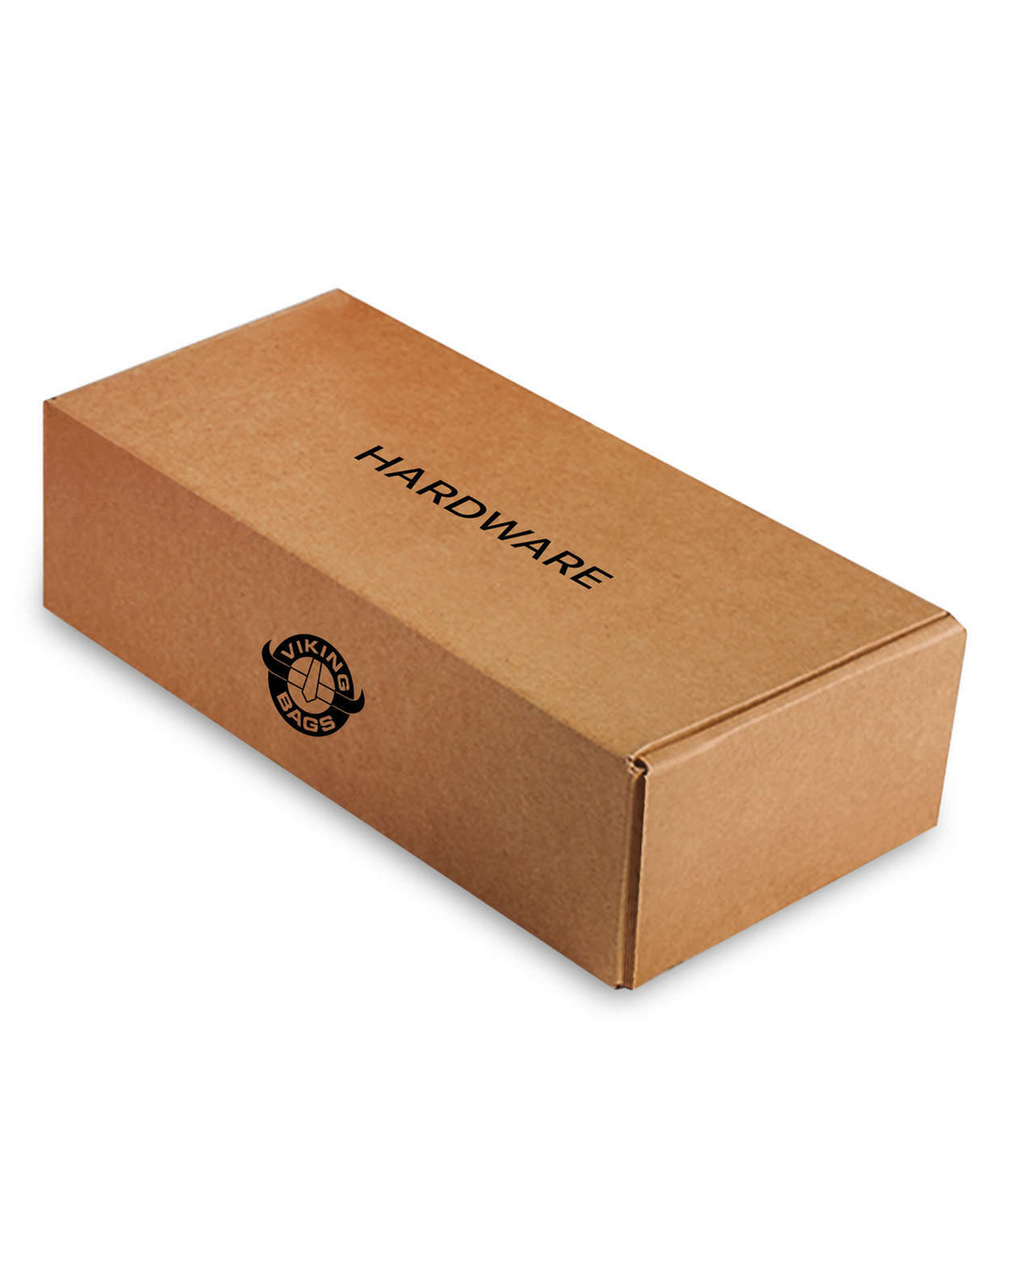 Yamaha Startoliner XV 1900 Pinnacle Motorcycle Saddlebags Hardware Box